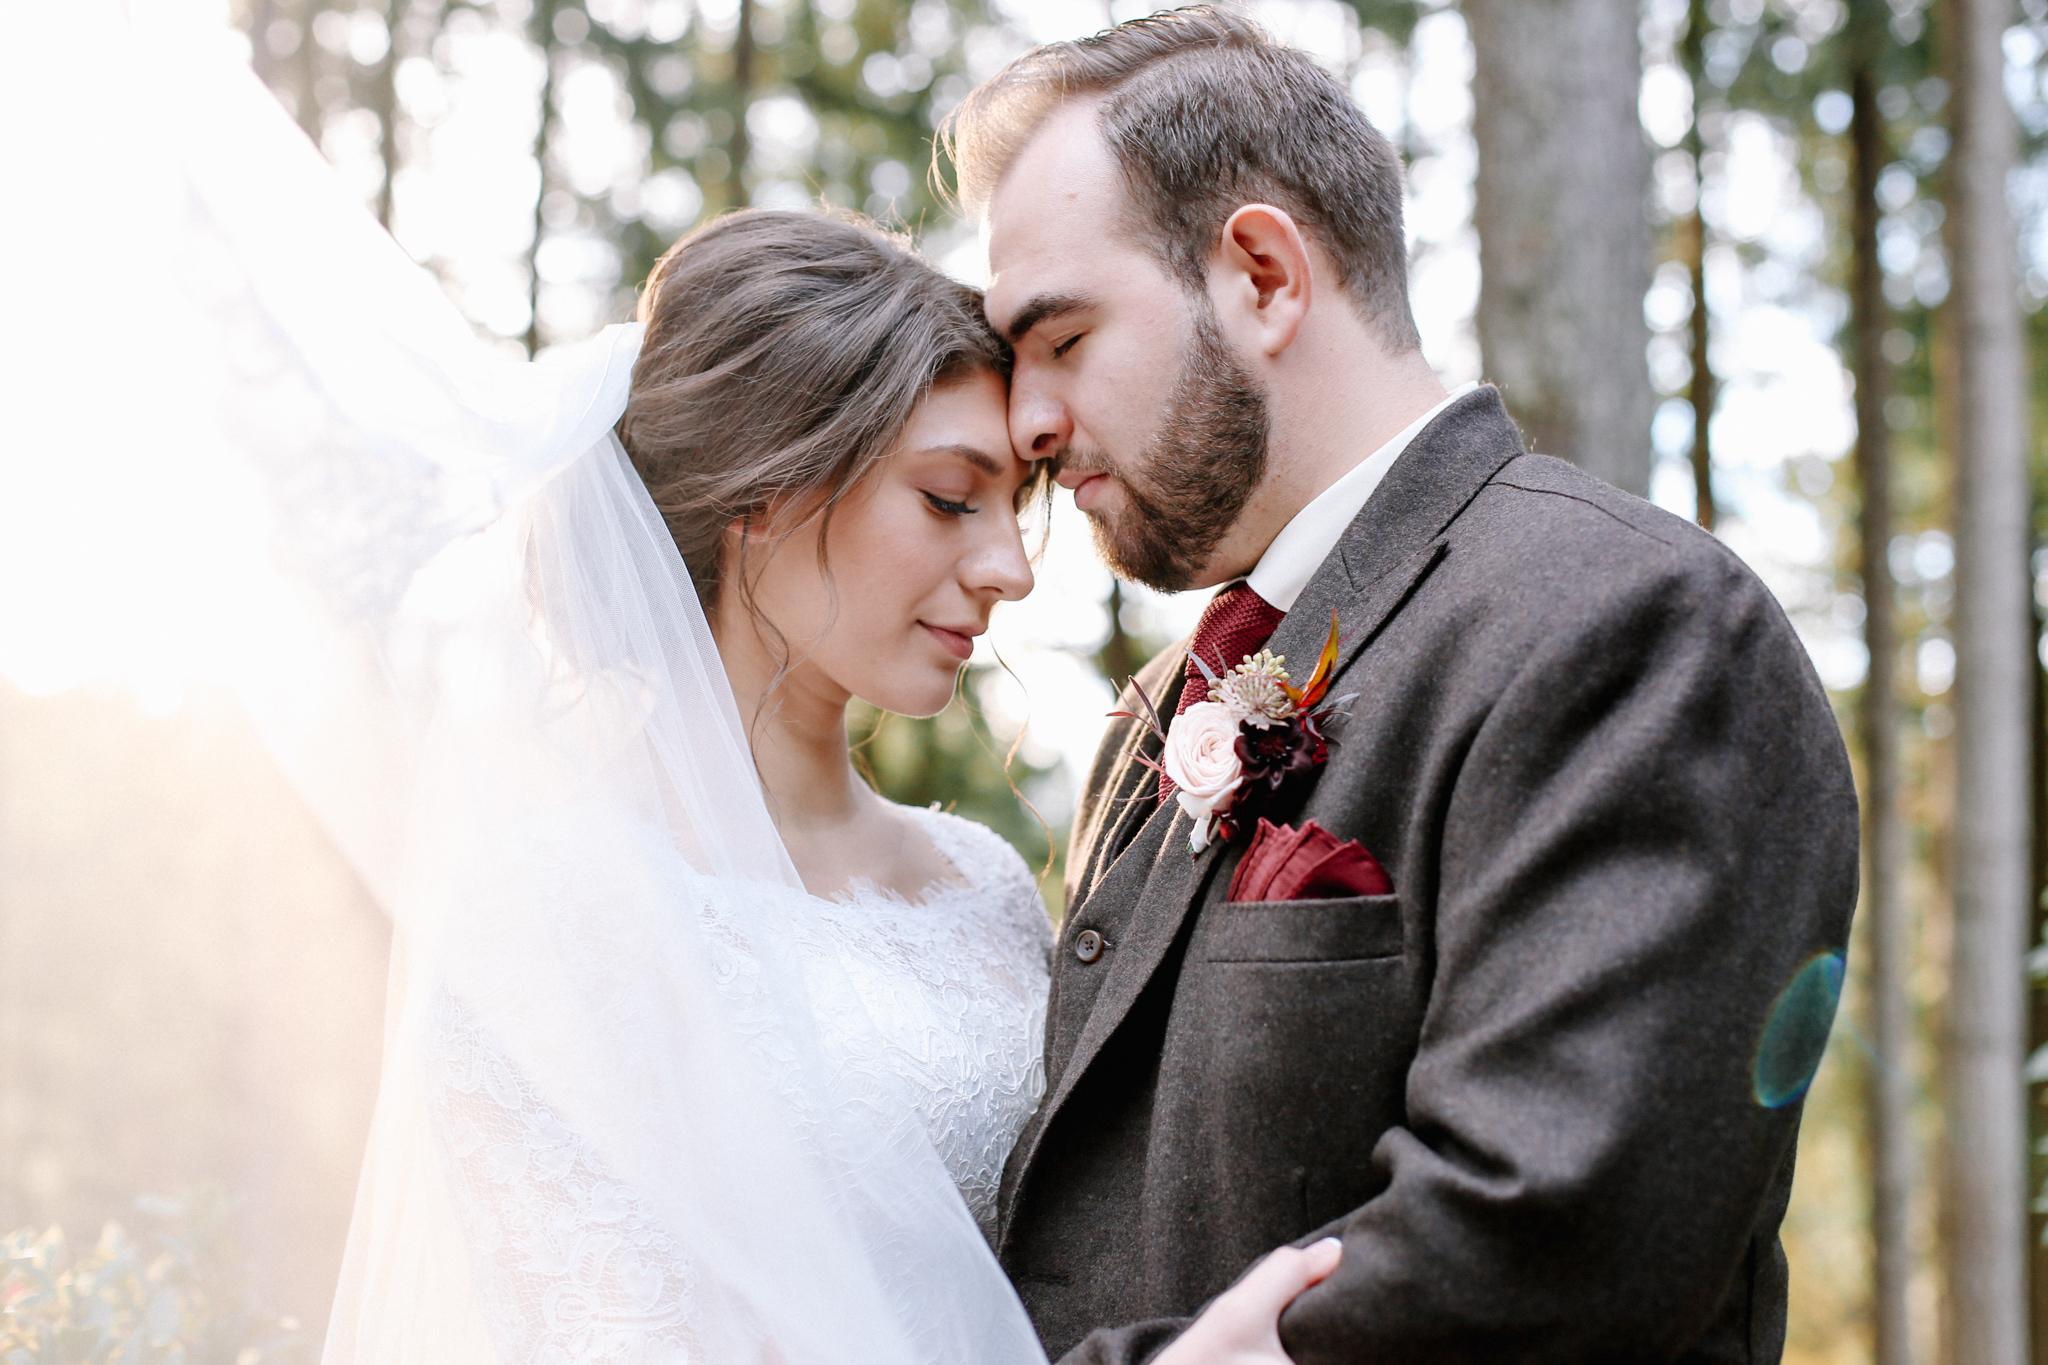 Manu and Laura - Portland Wedding Photographer - 26.jpg